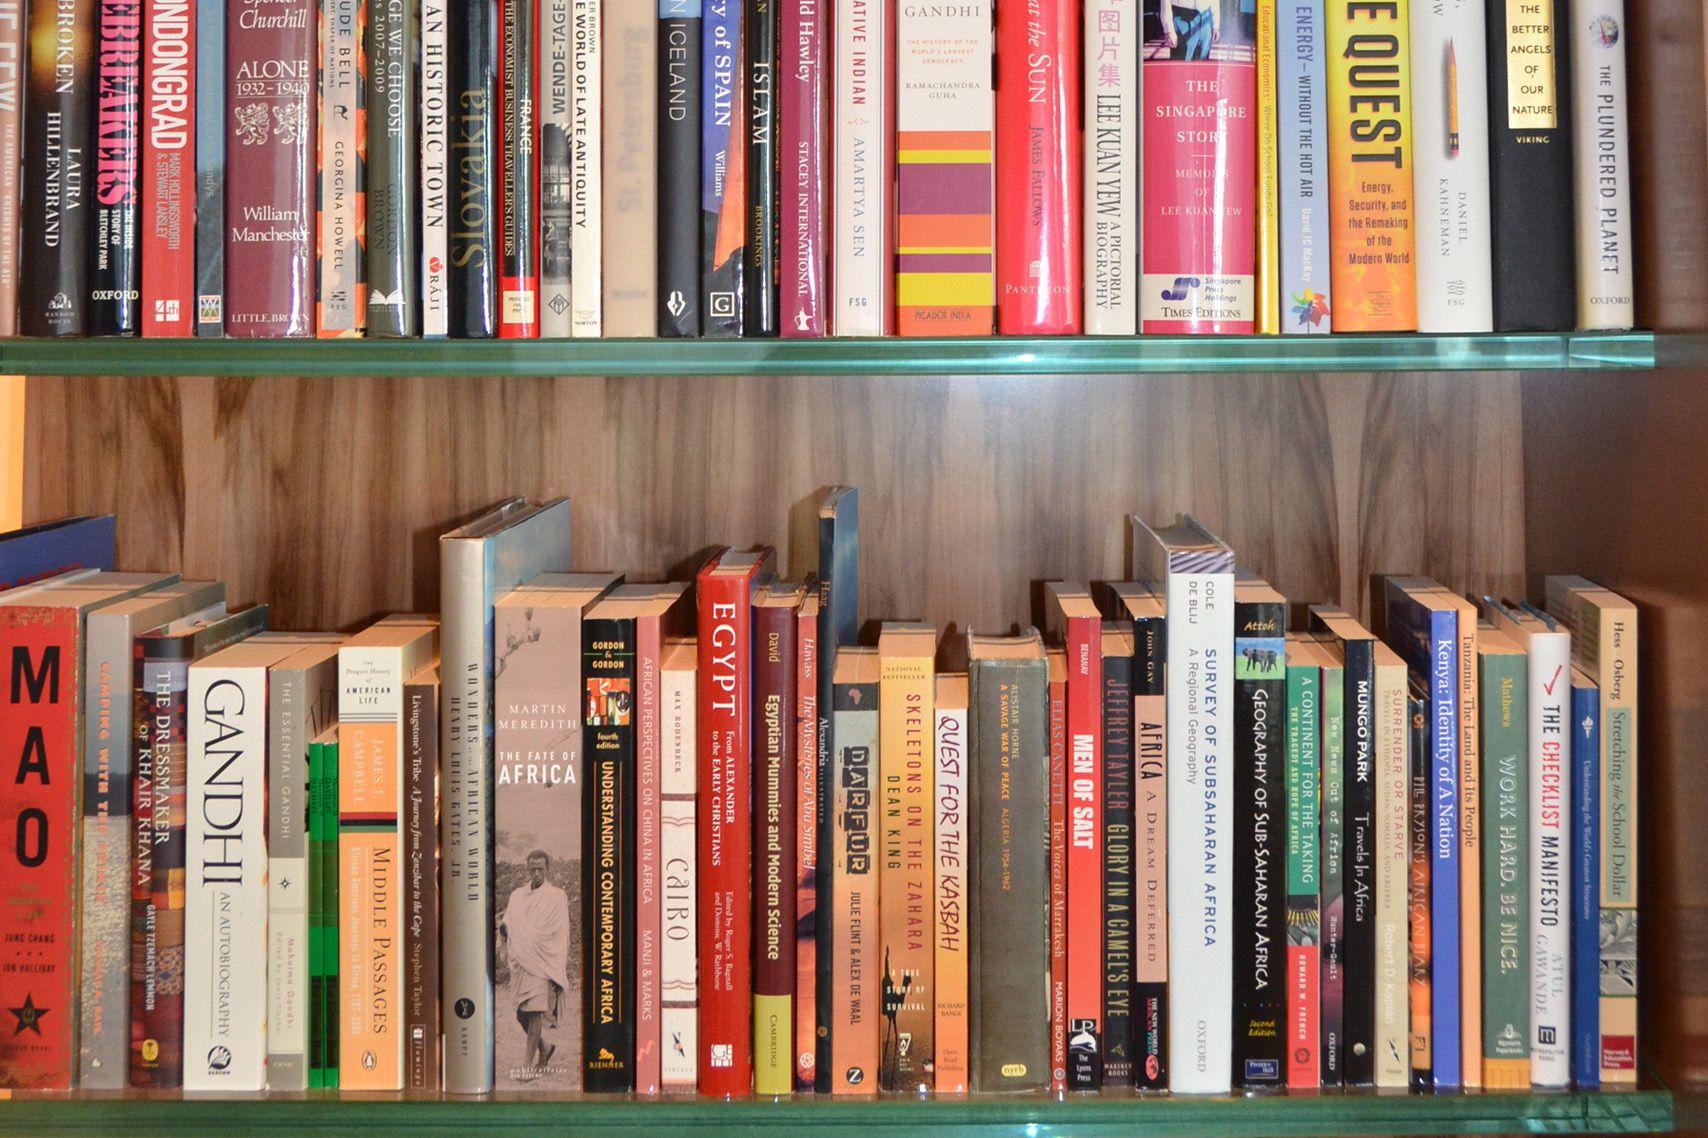 100 Images of Bill Gates Bookshelf